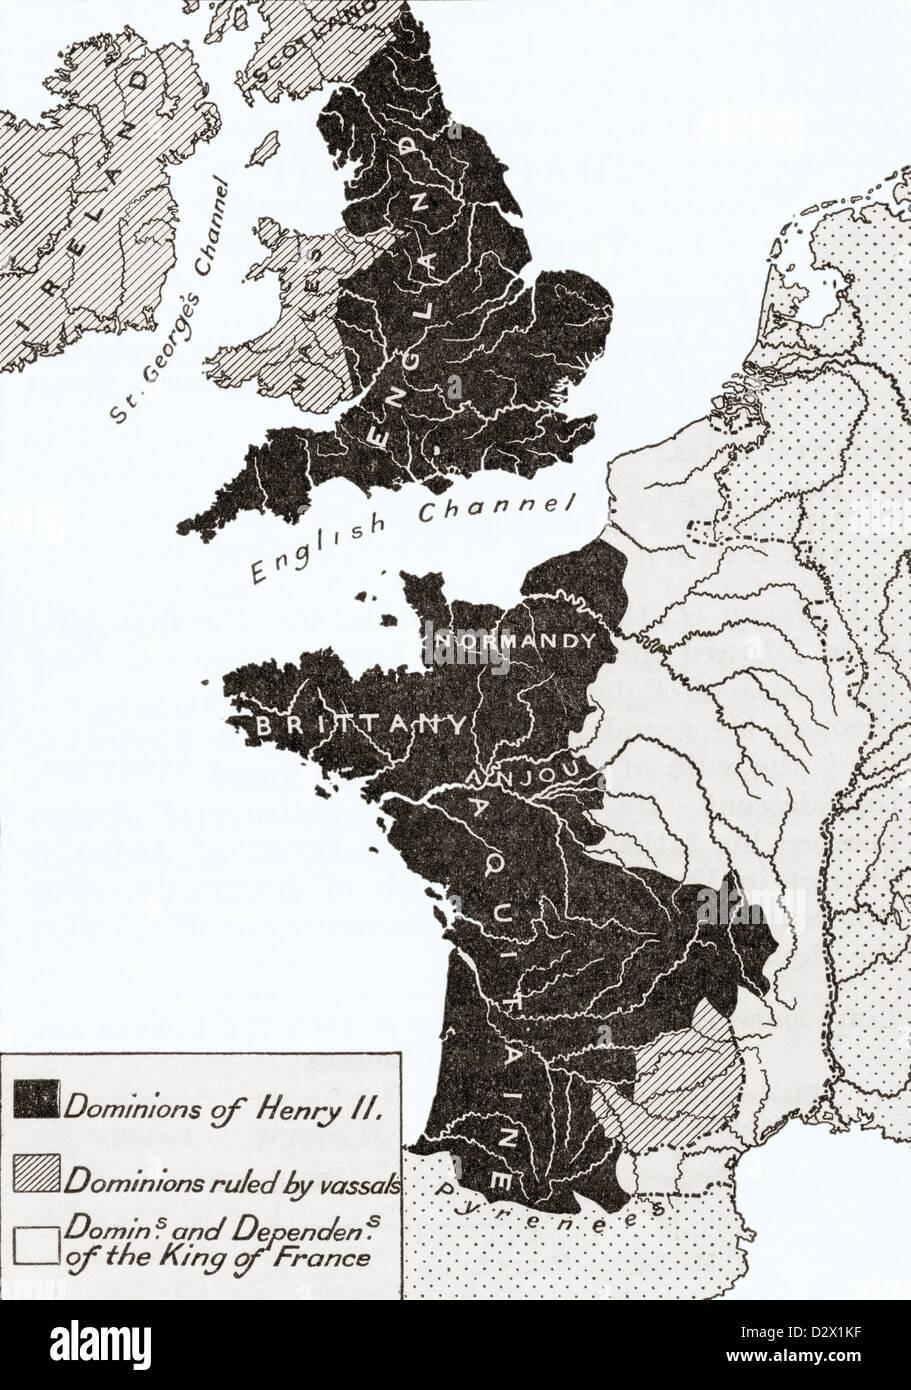 England On Map on england city map, england on worldmap, england flag, england europe map, england food, england on globe, england united kingdom political map, scotland ireland uk map, london map, england shape, england poppies, holy roman empire map, england civil war map, england london, world map, england on google earth, uk great britain map, new england states us map, england christmas, england map hd,